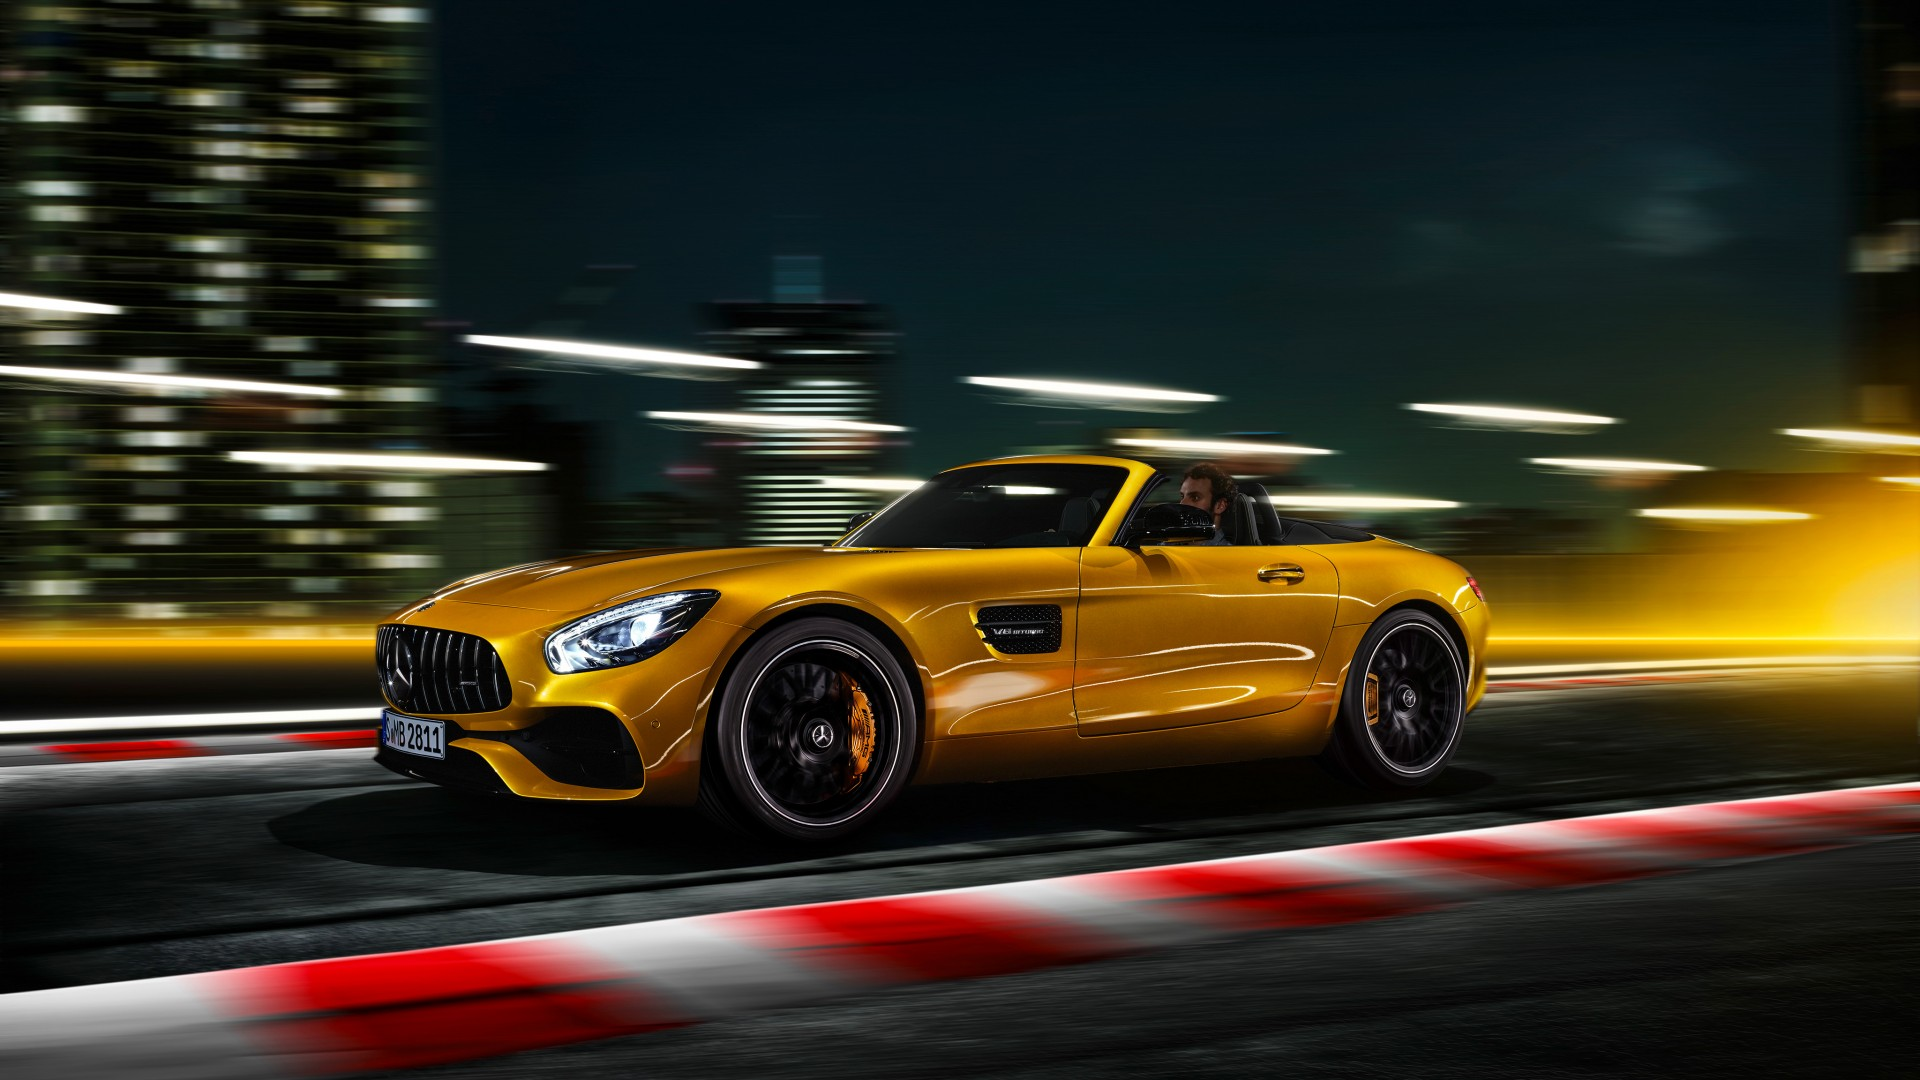 2018 Mercedes Amg Gt S Roadster 4k 3 Wallpaper Hd Car